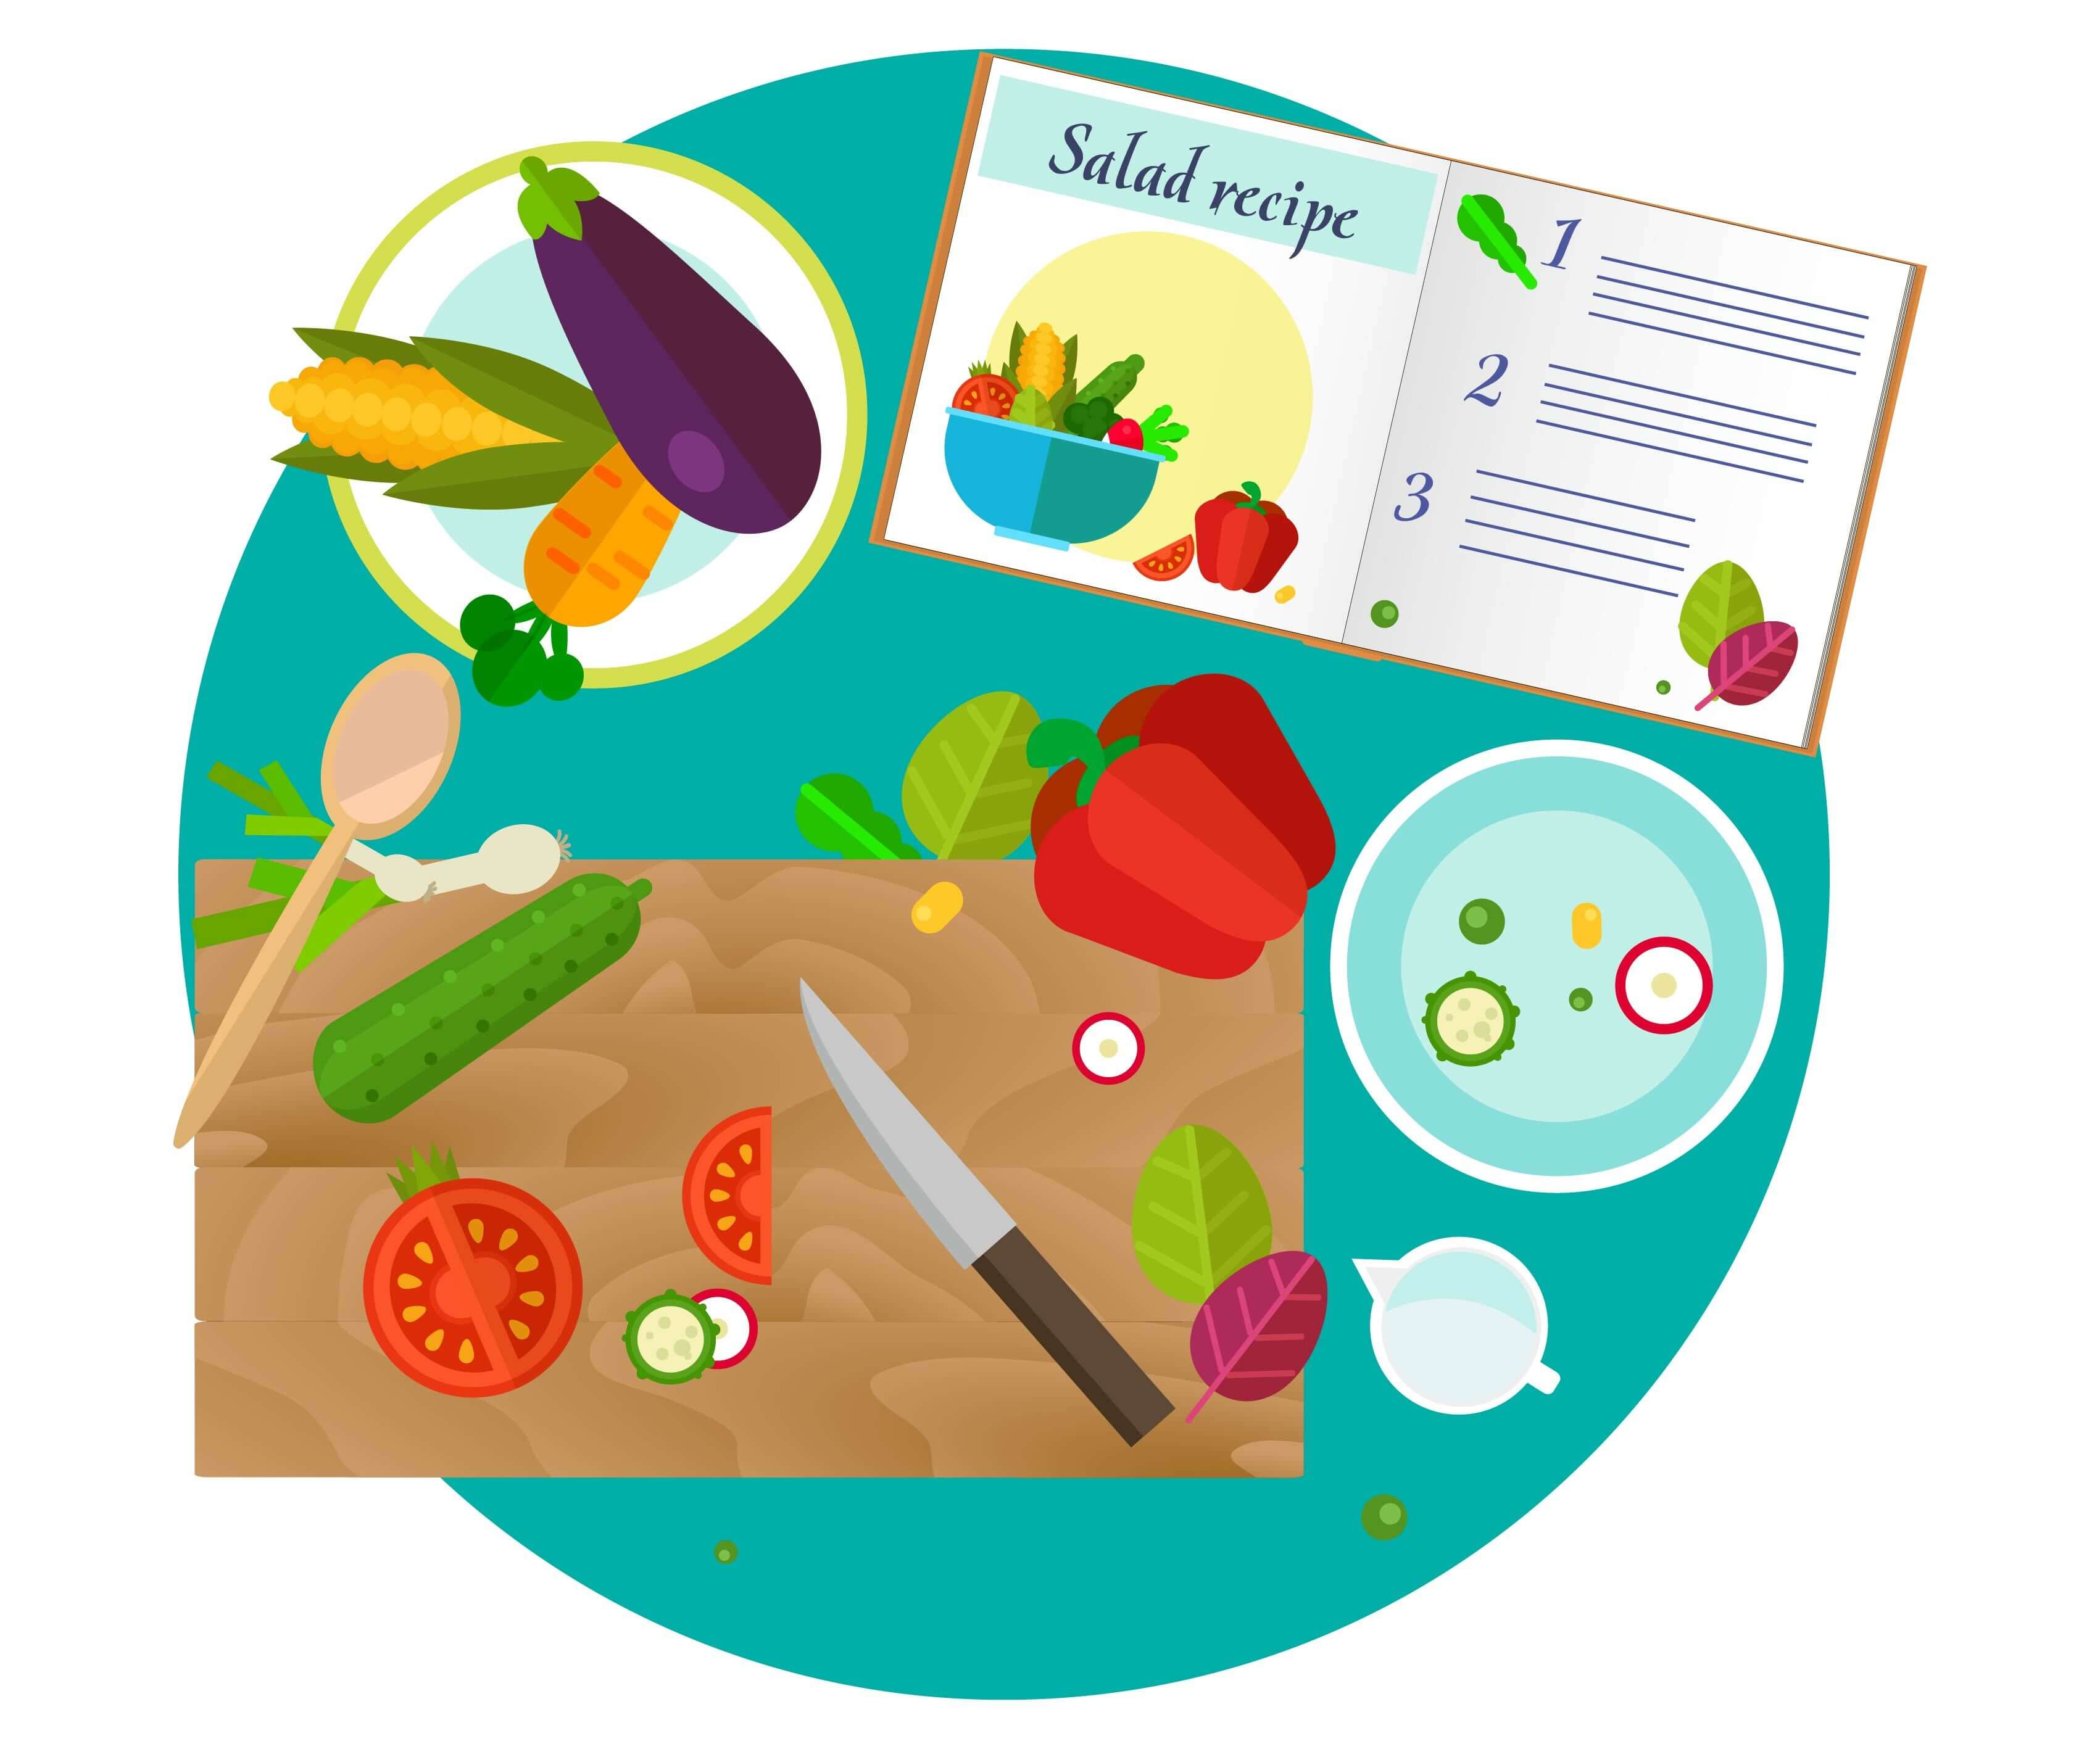 Cooking set for salad